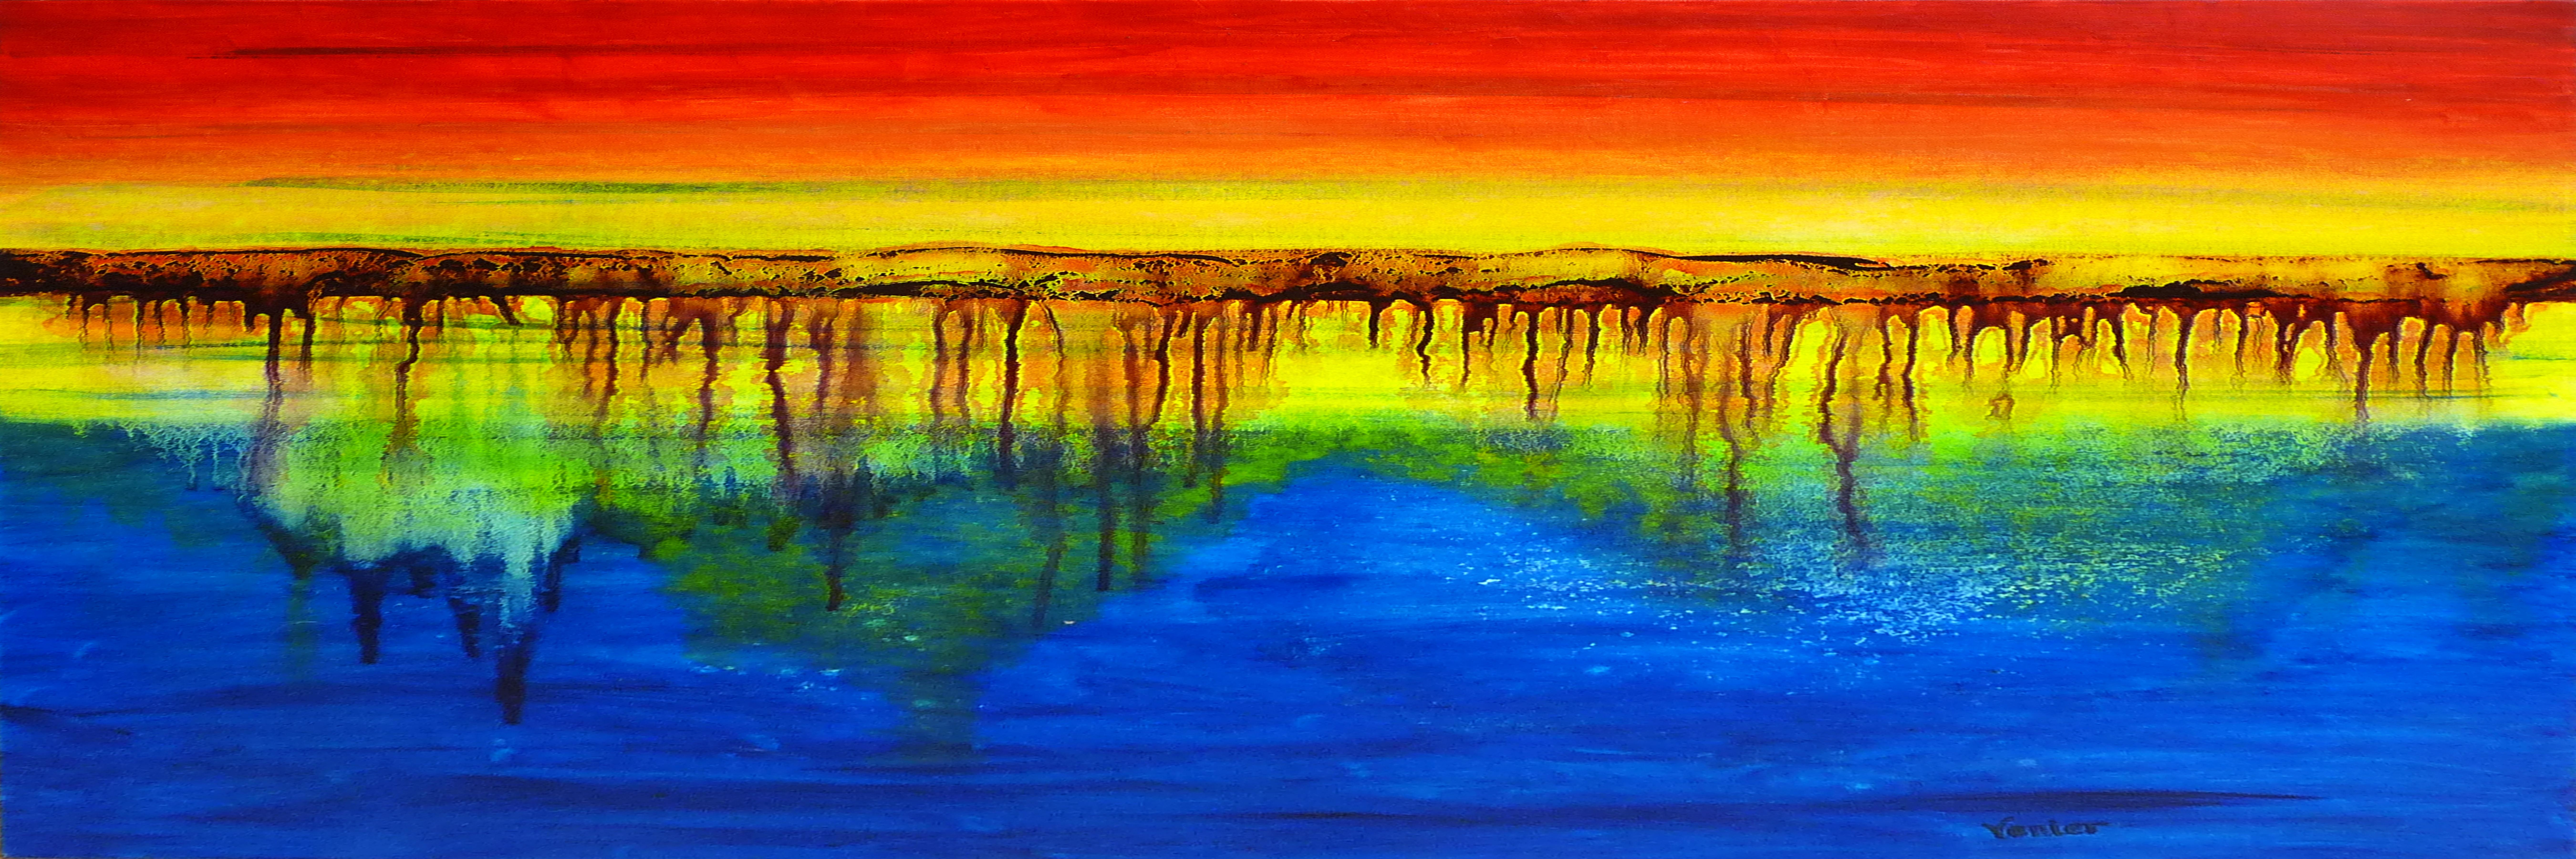 Leanne's healing colors painting 'Spectral Deptsh' used as a header